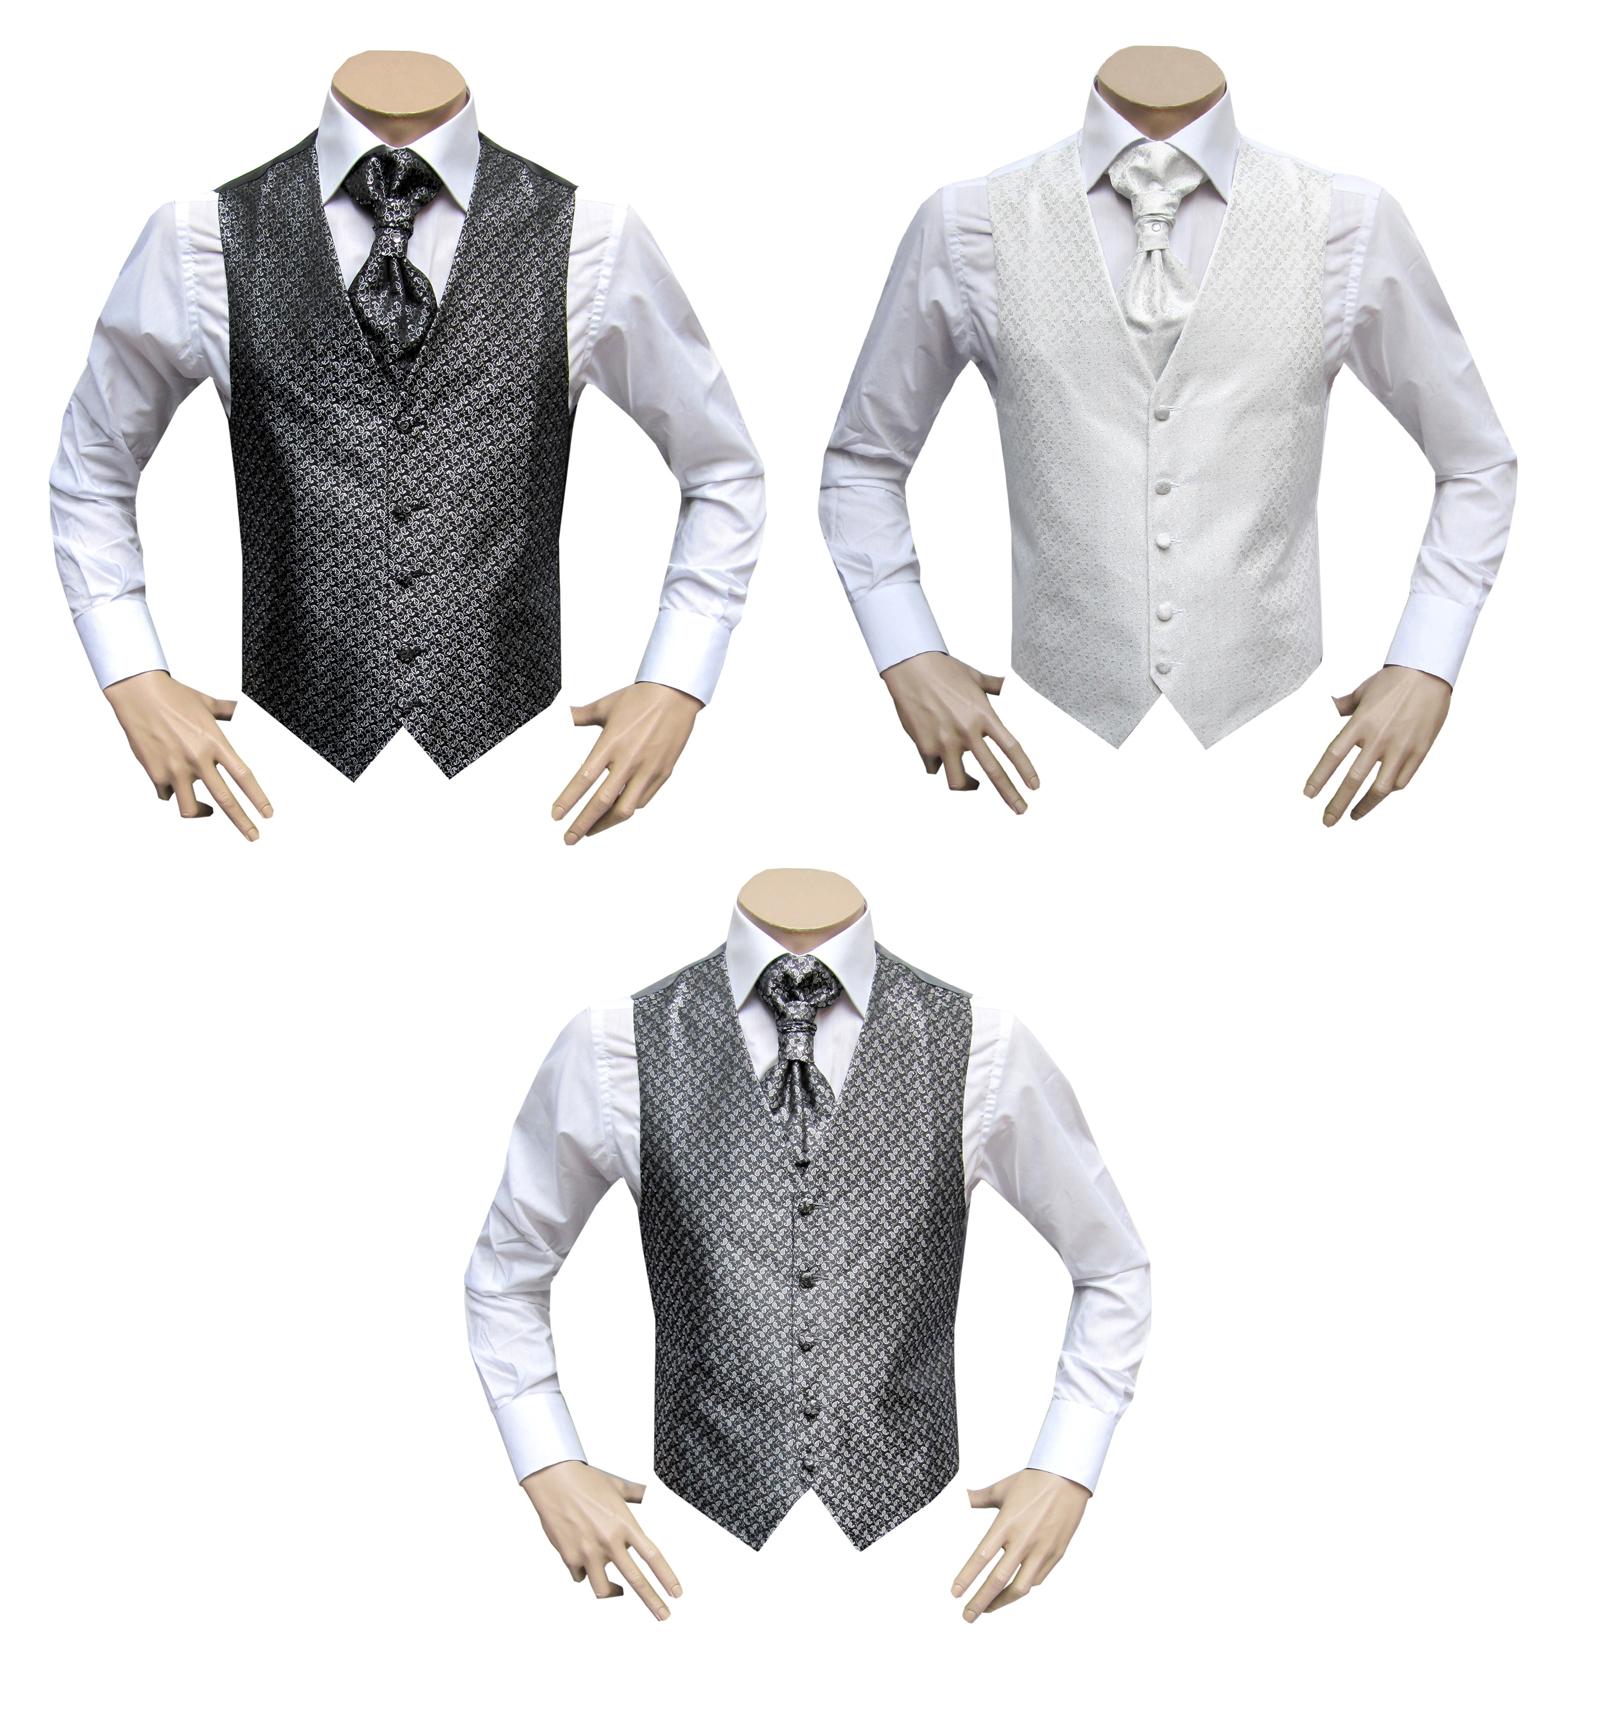 Mariage Gilet-Accessoires - Homme-Costume-Gilet 9cfbf642f43